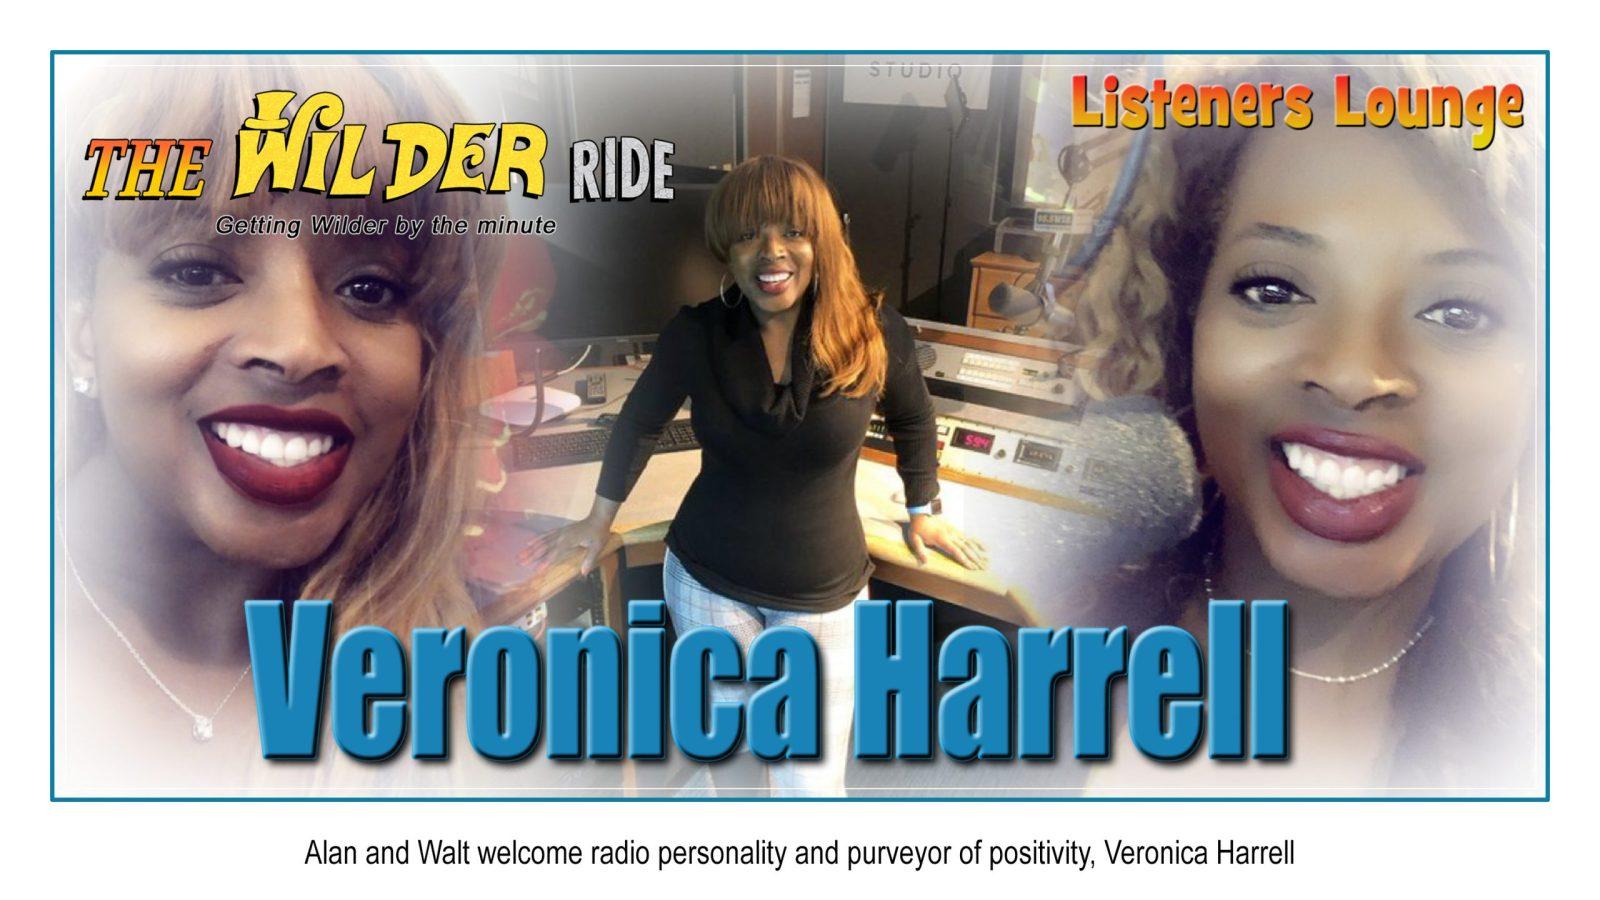 Veronica Harrell